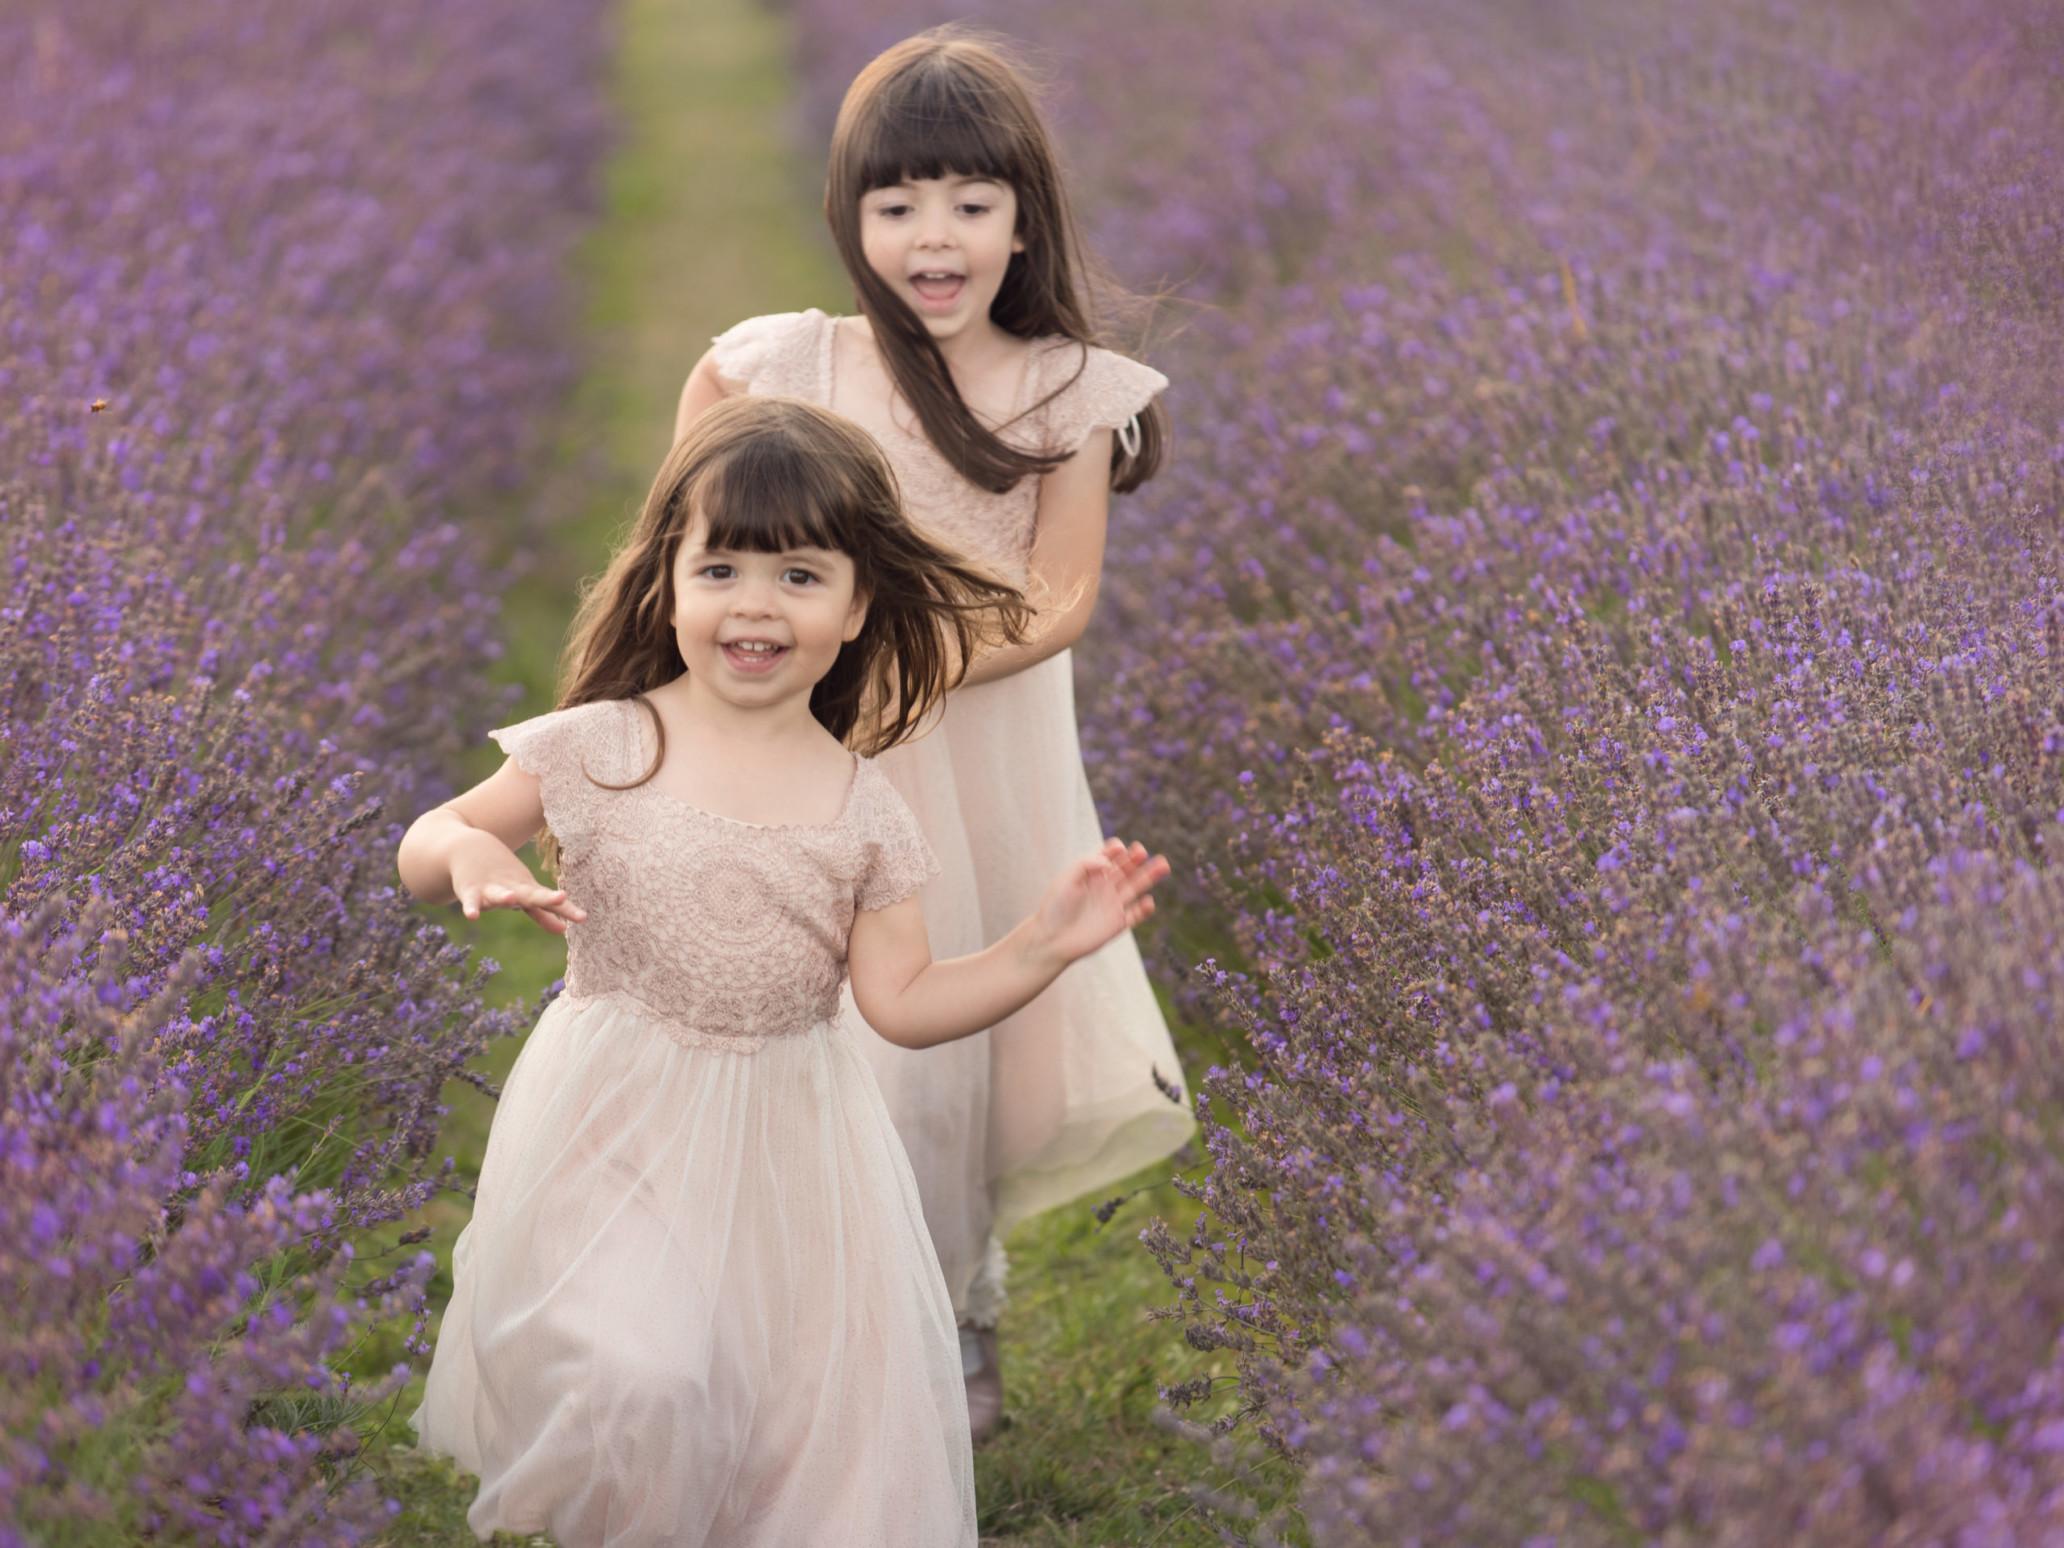 girls running in lavender